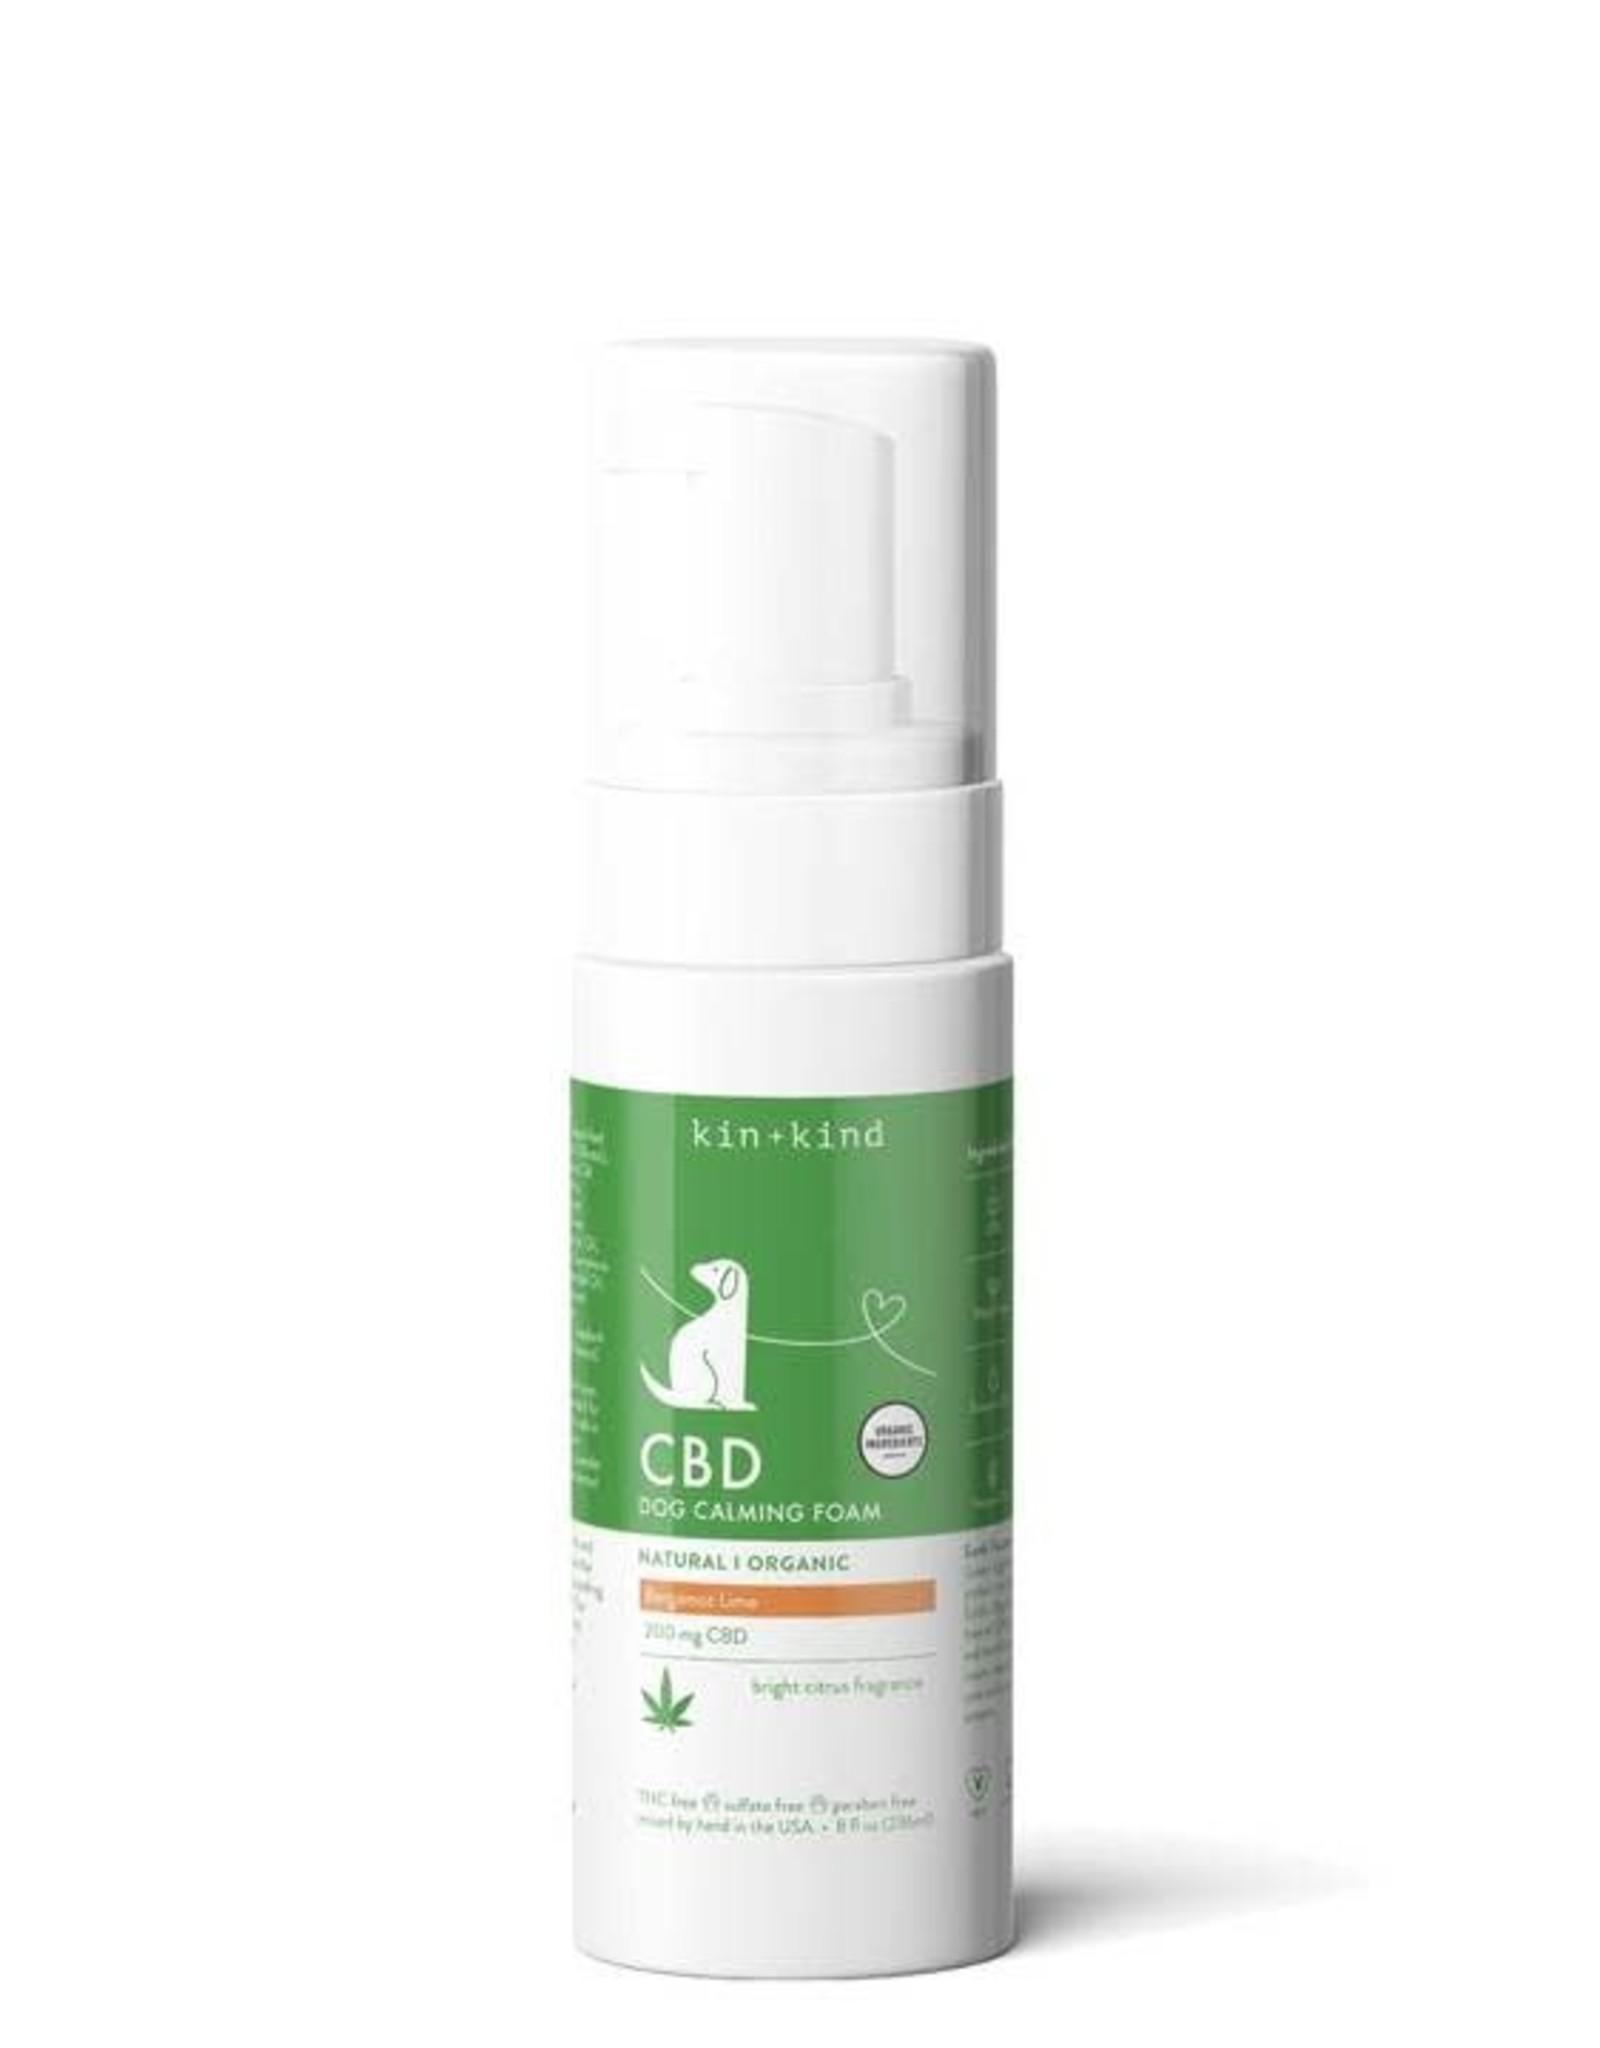 Kin+Kind Kin+Kind CBD Calming Foam - Bergamot Lime